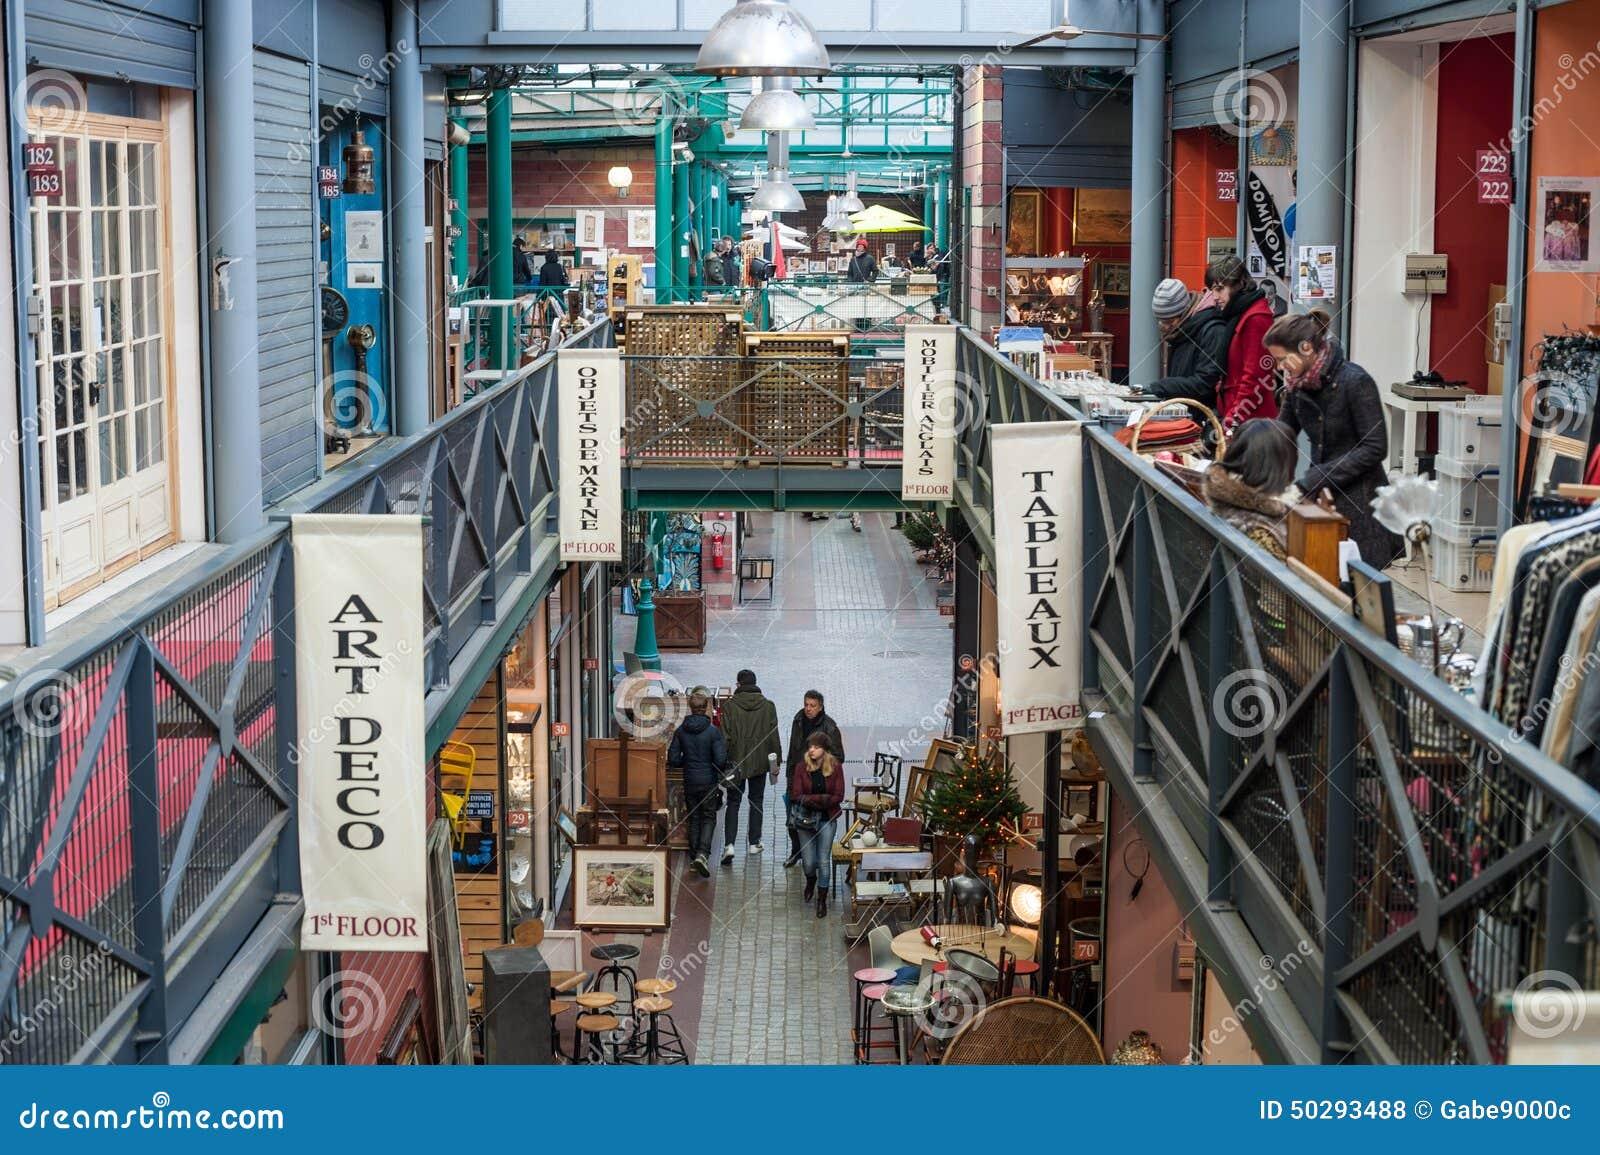 Binnenland van de vlooienmarkt st ouen in parijs - Porte saint ouen ...